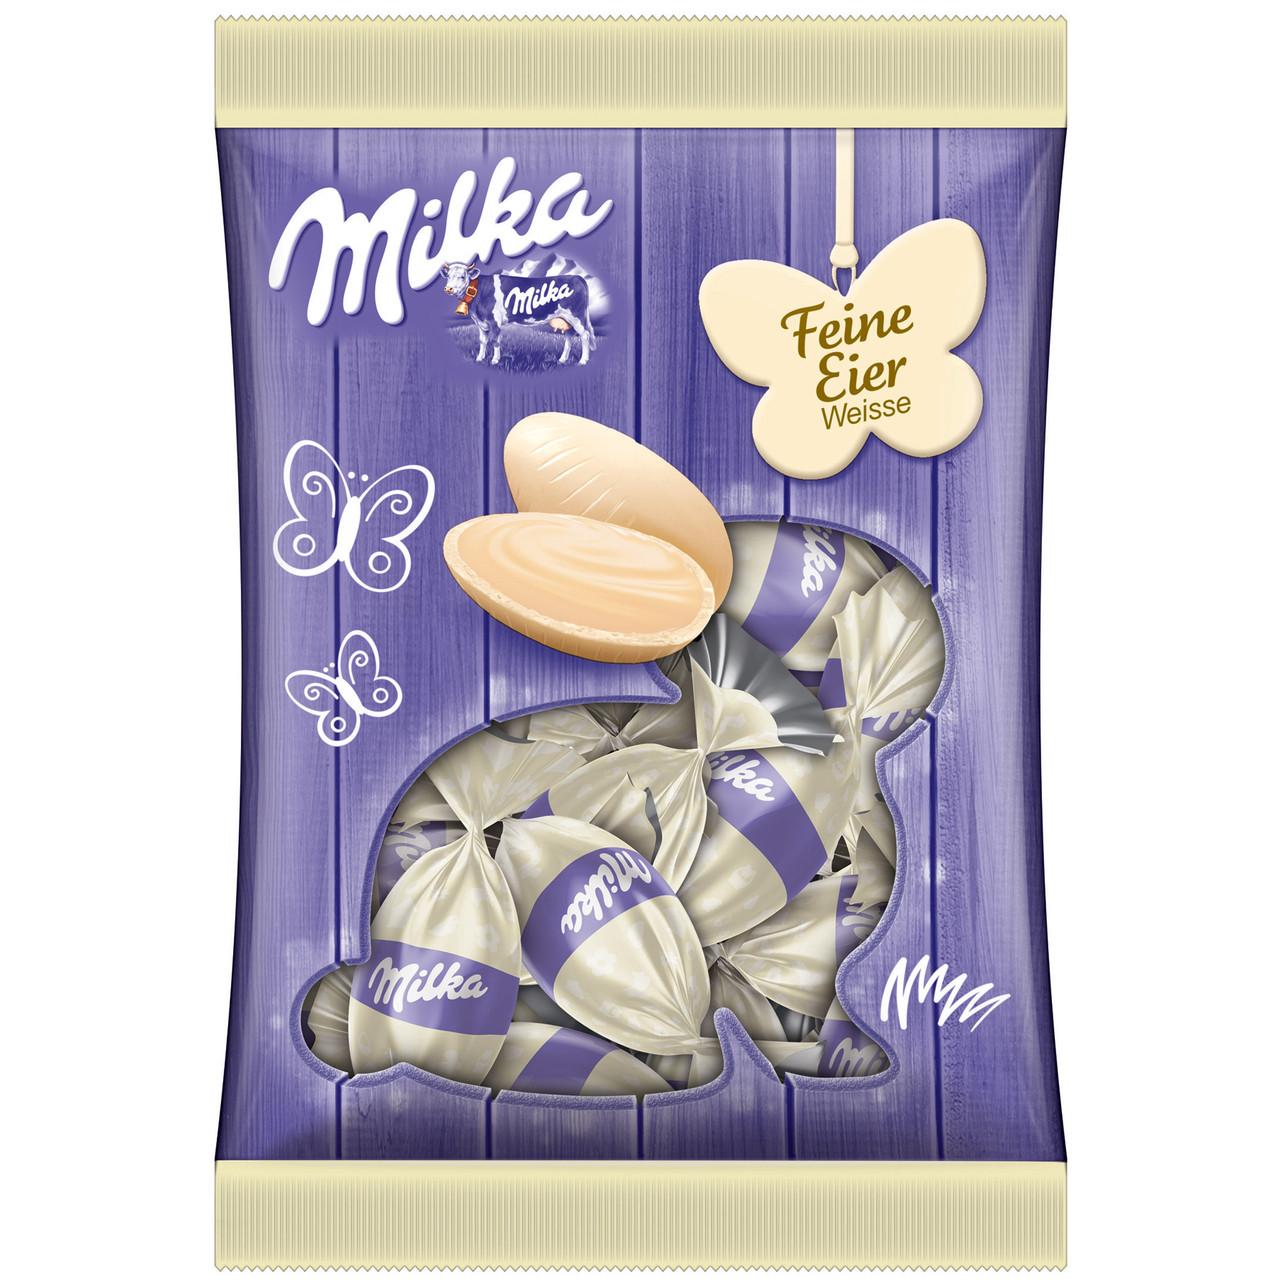 Шоколадні яєчка Milka «Feine Eier Weisse» (Білий шоколад), 90 р.